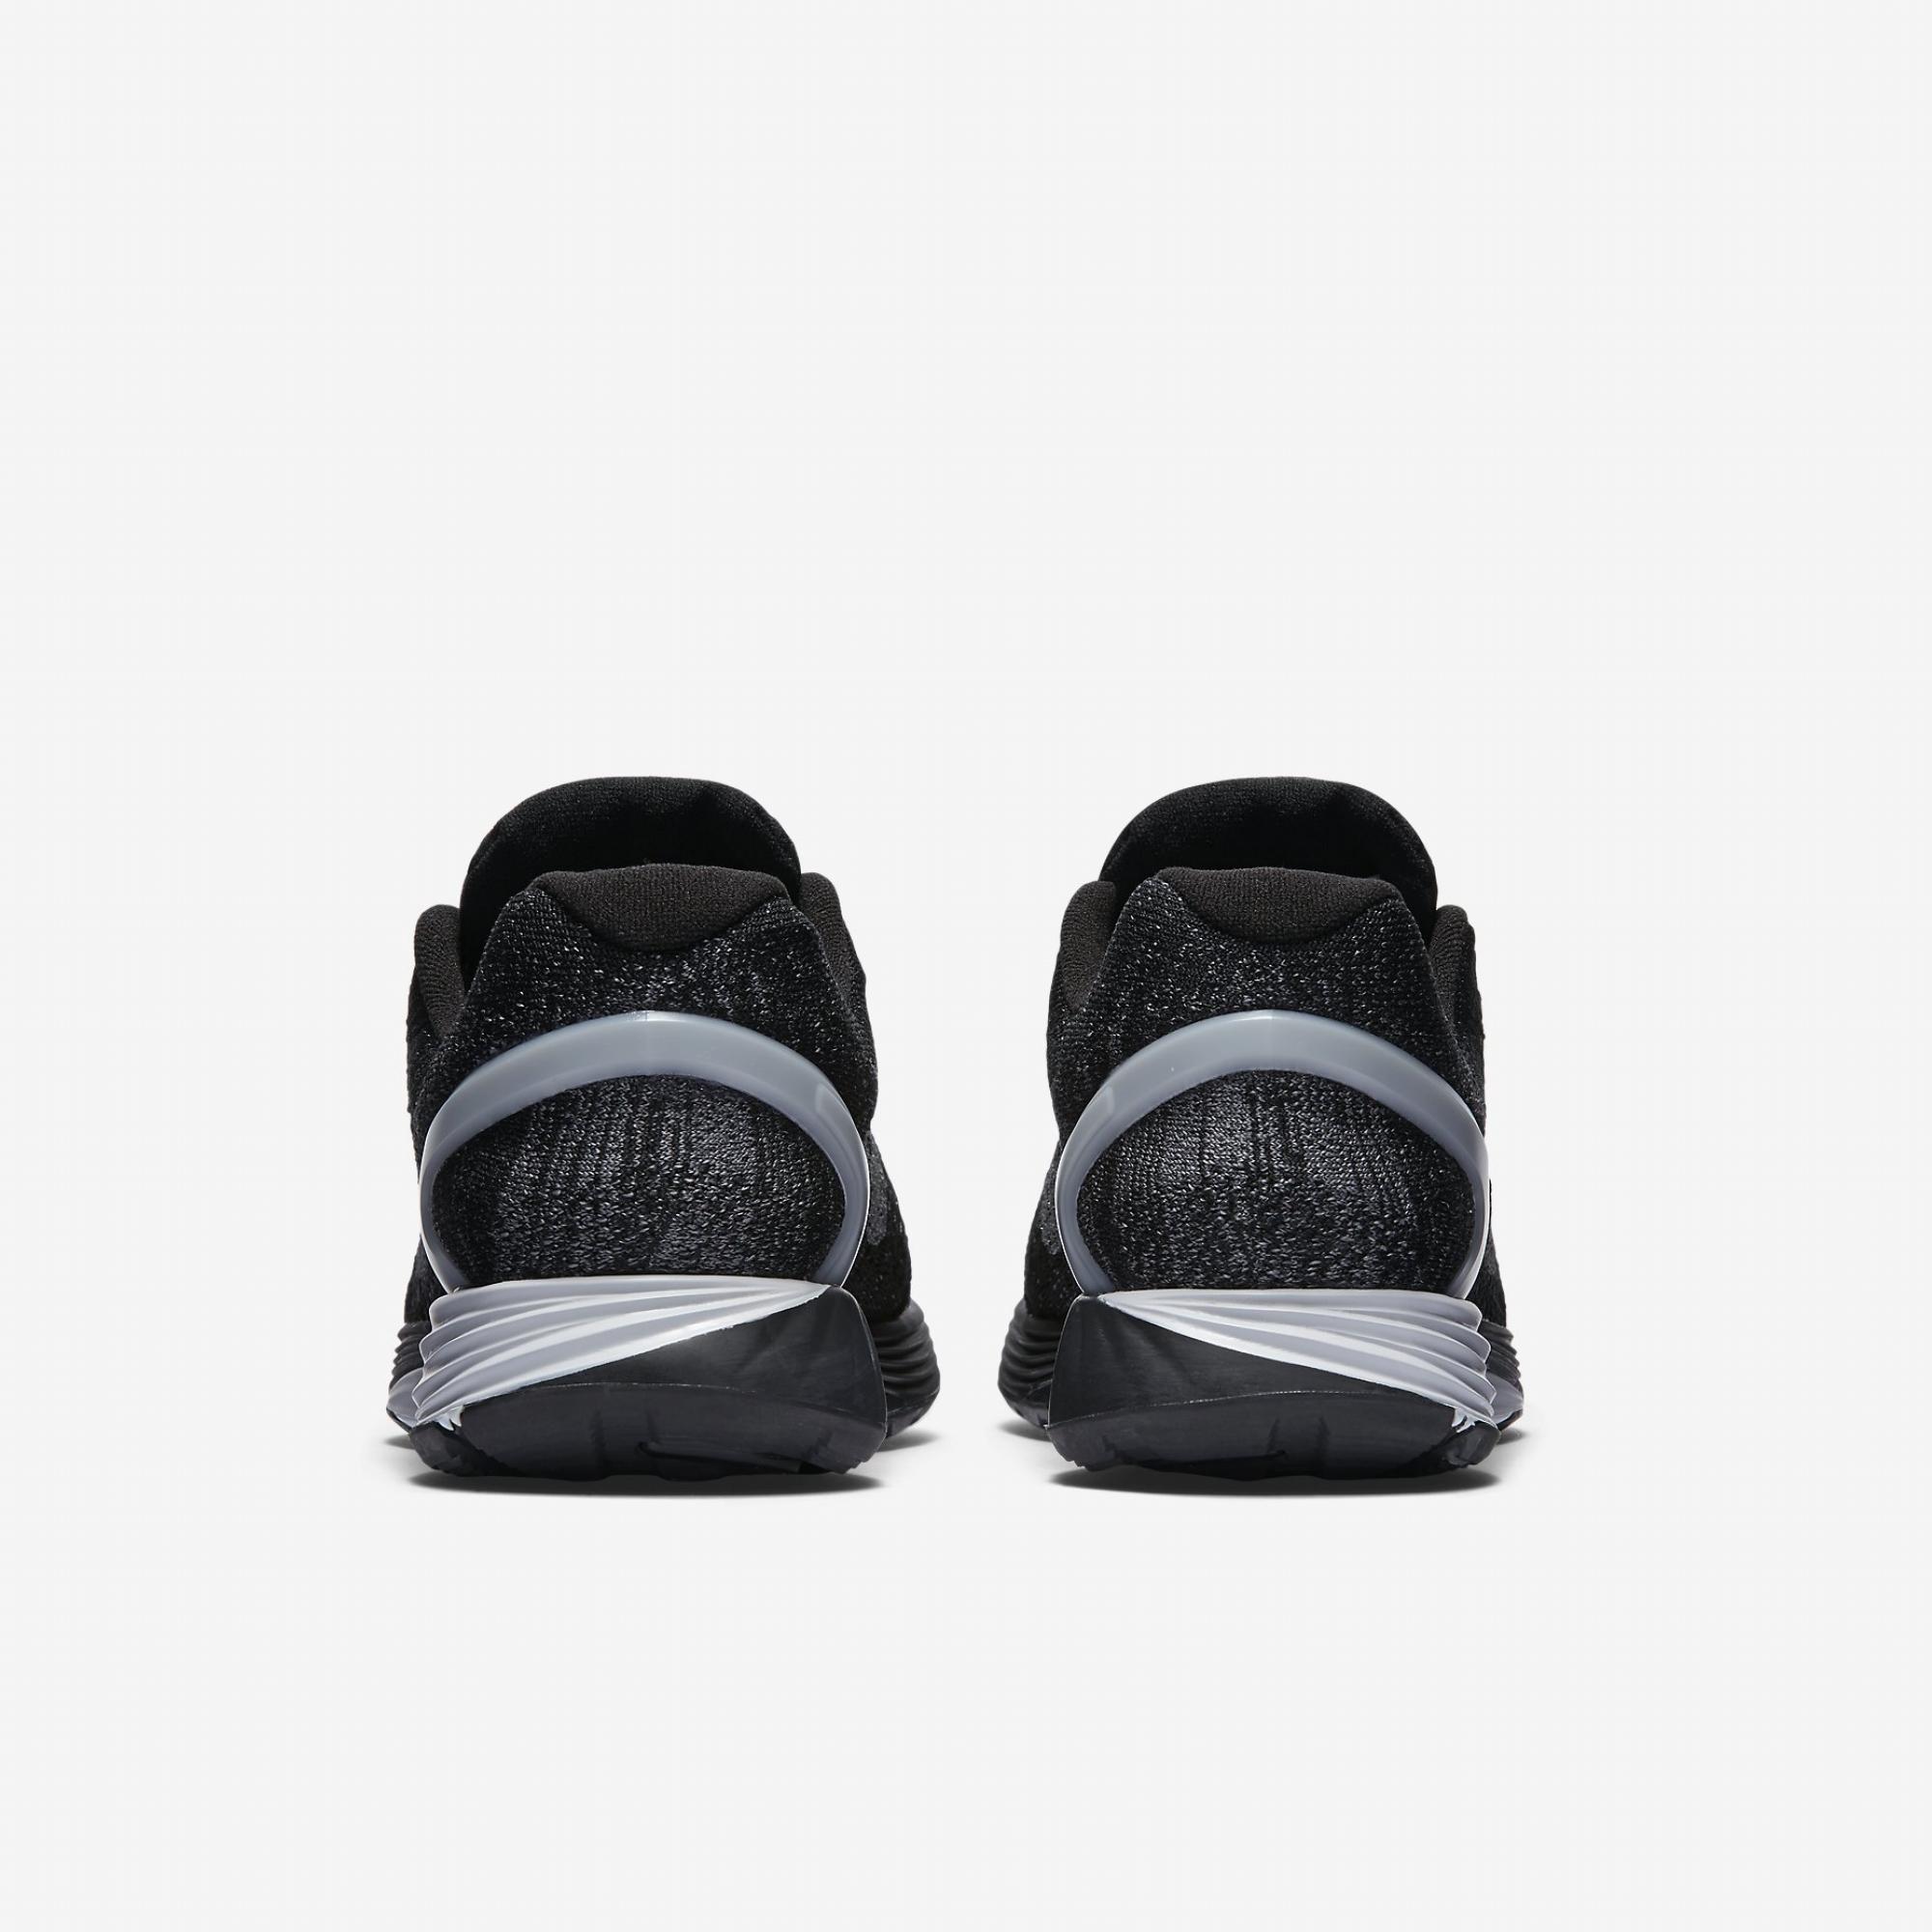 buy popular 8057a 5ae5a ... Nike Lunarglide 7 Flash Erkek Spor Ayakkabı ...